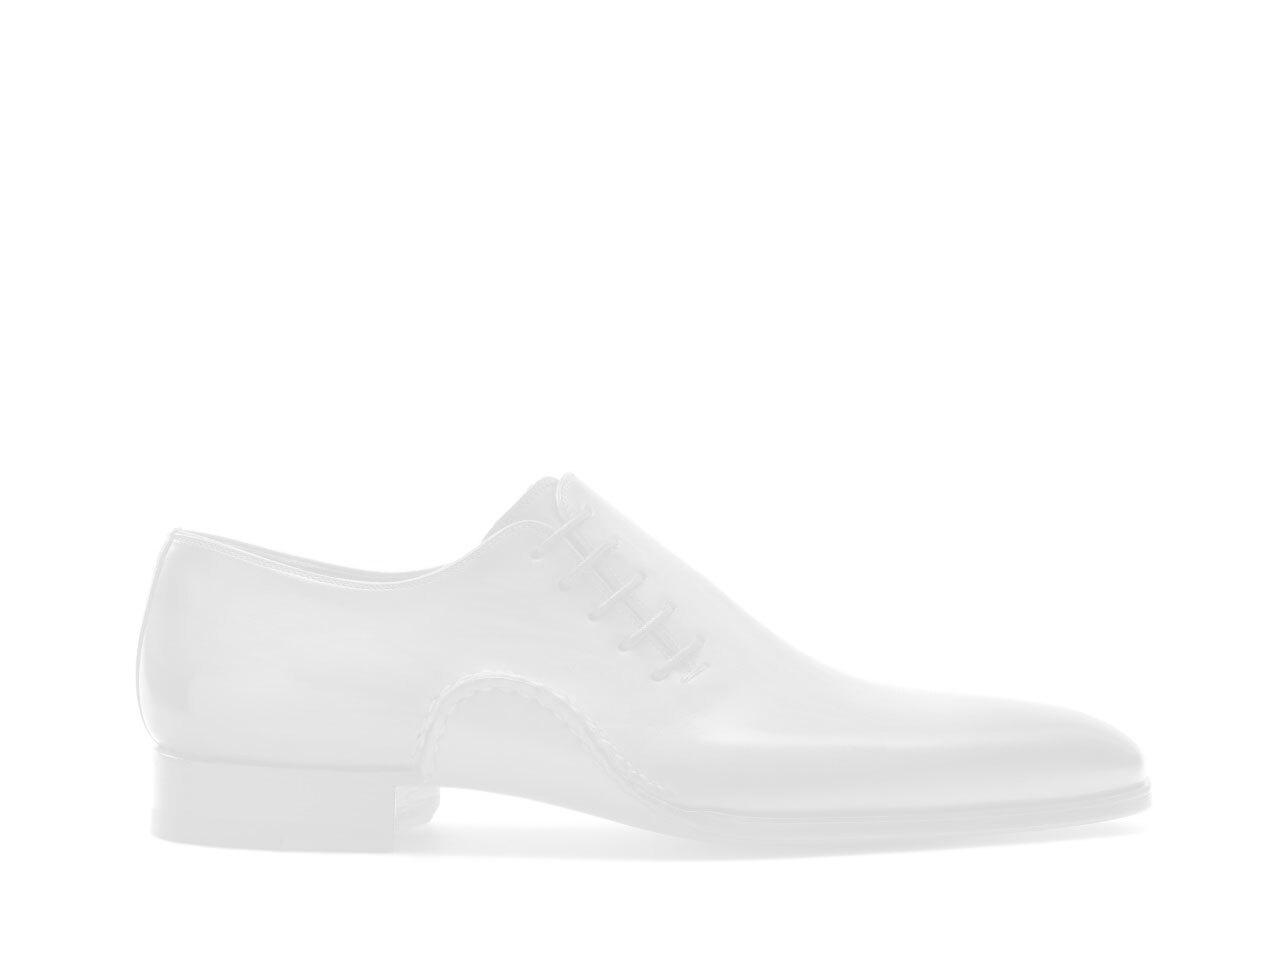 Neutral premium beeswax polish - Magnanni shoe care